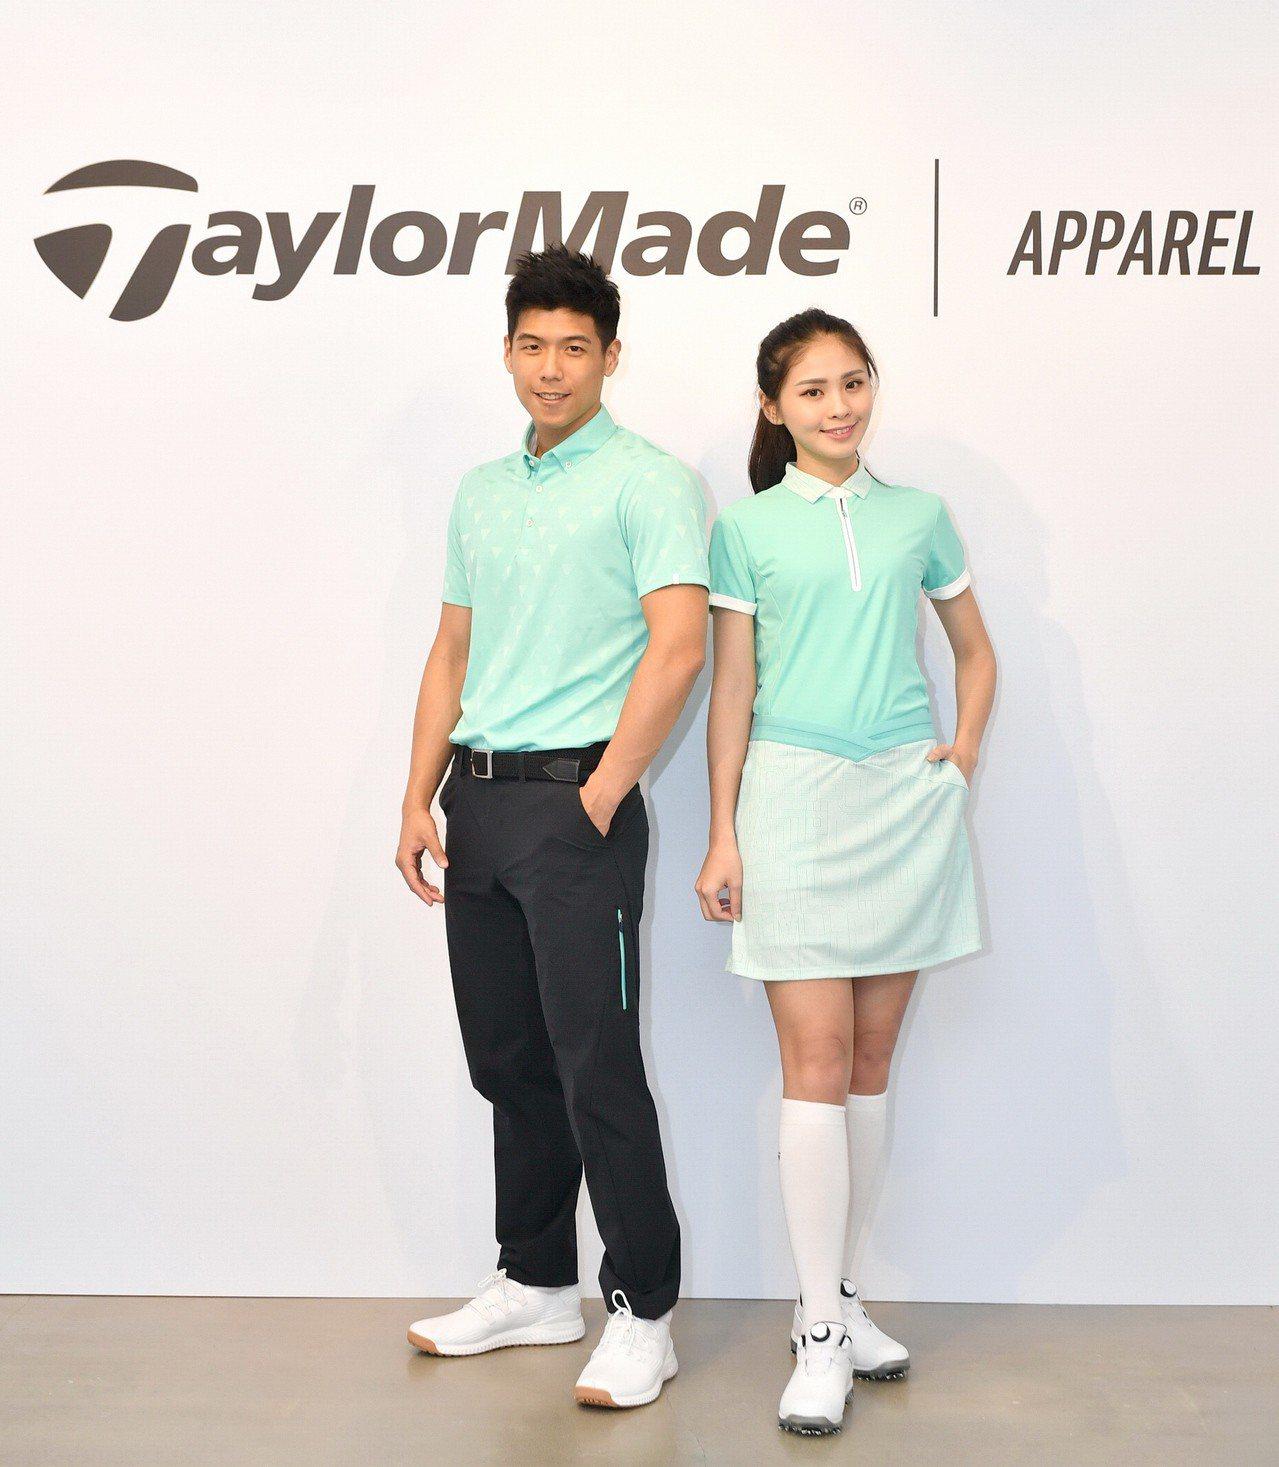 TaylorMade Apparel服飾具高延展、輕量快乾的材質,是運動時尚新選...